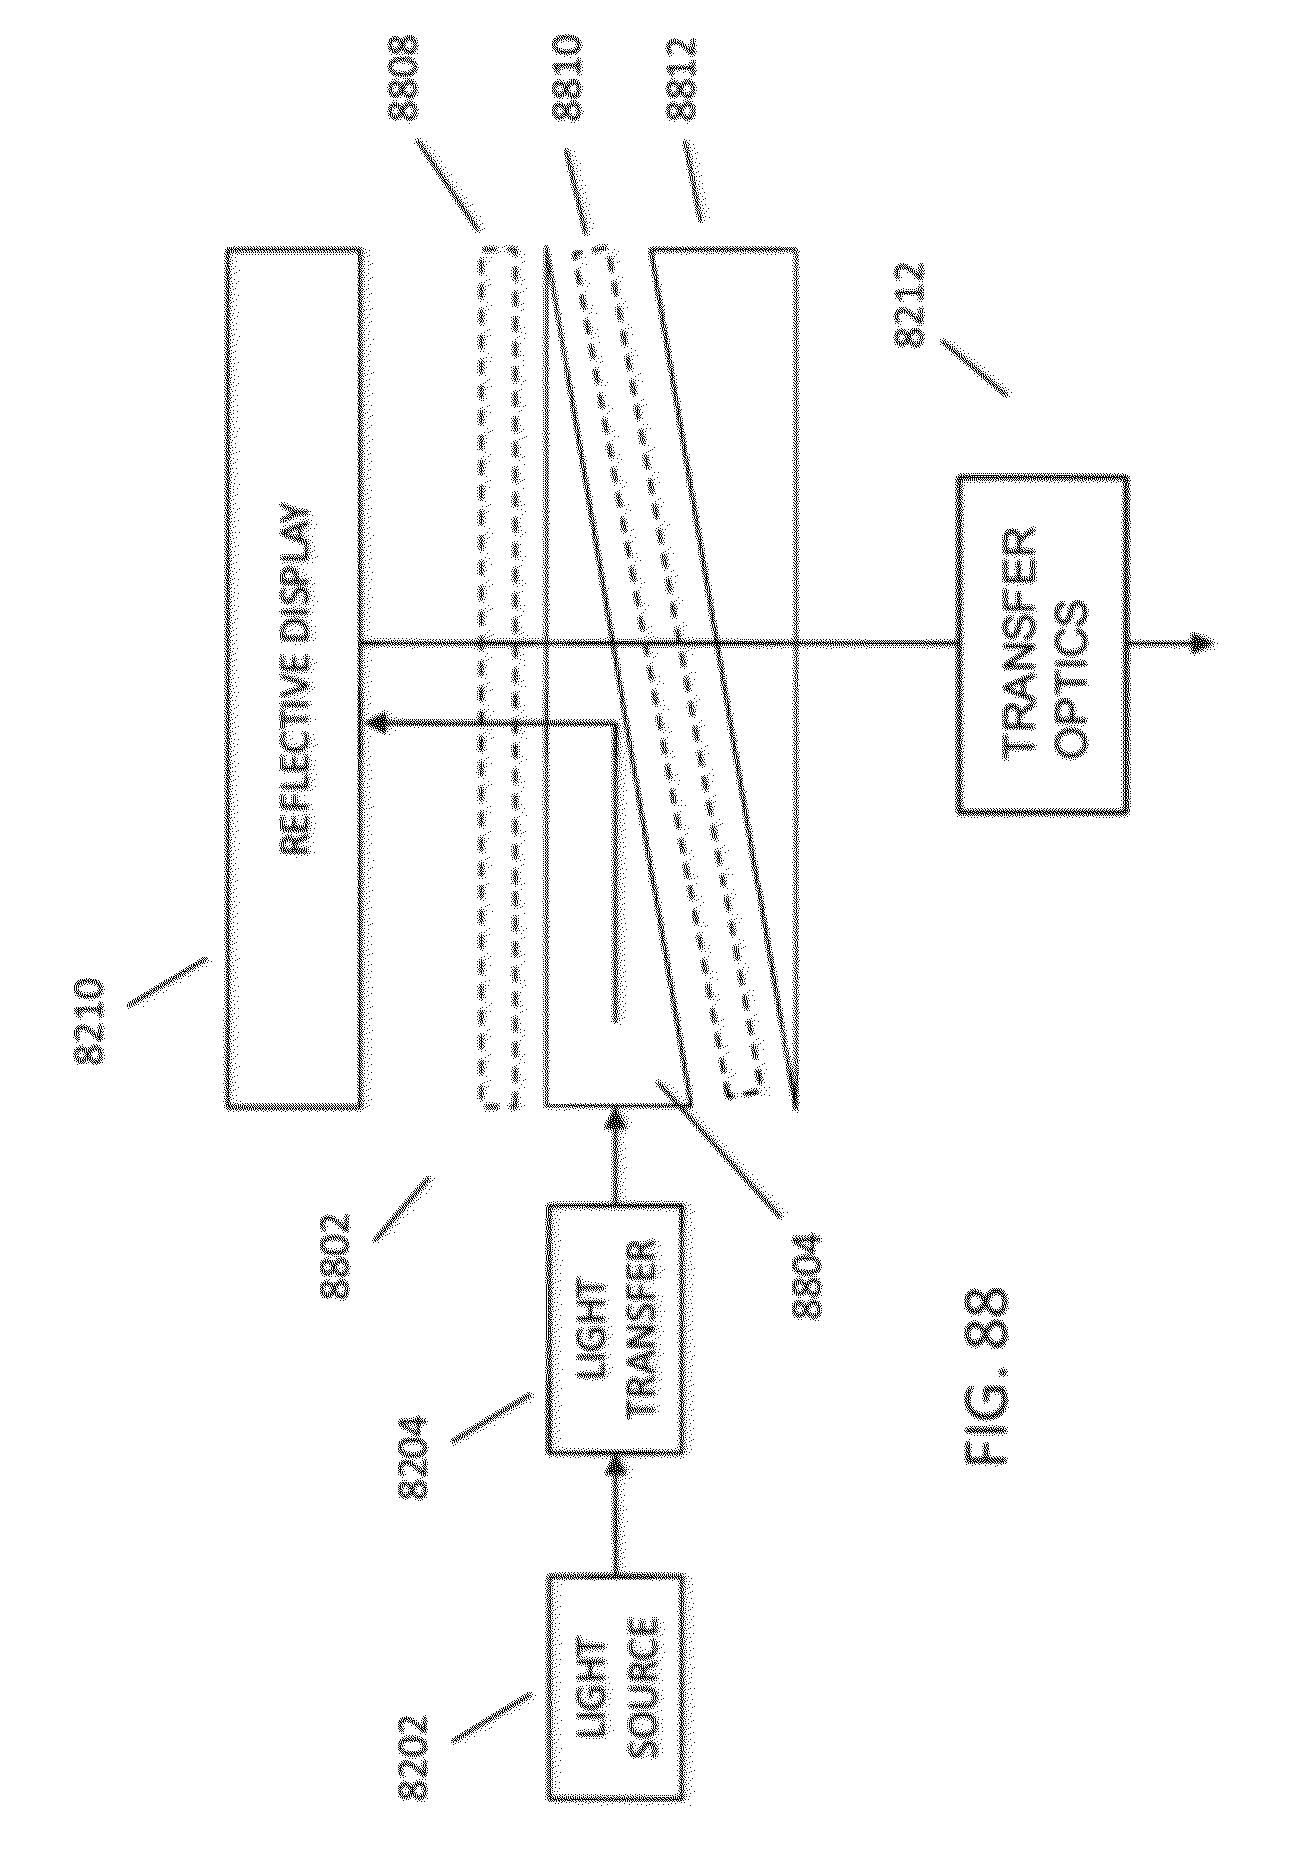 Patent US 9,129,295 B2